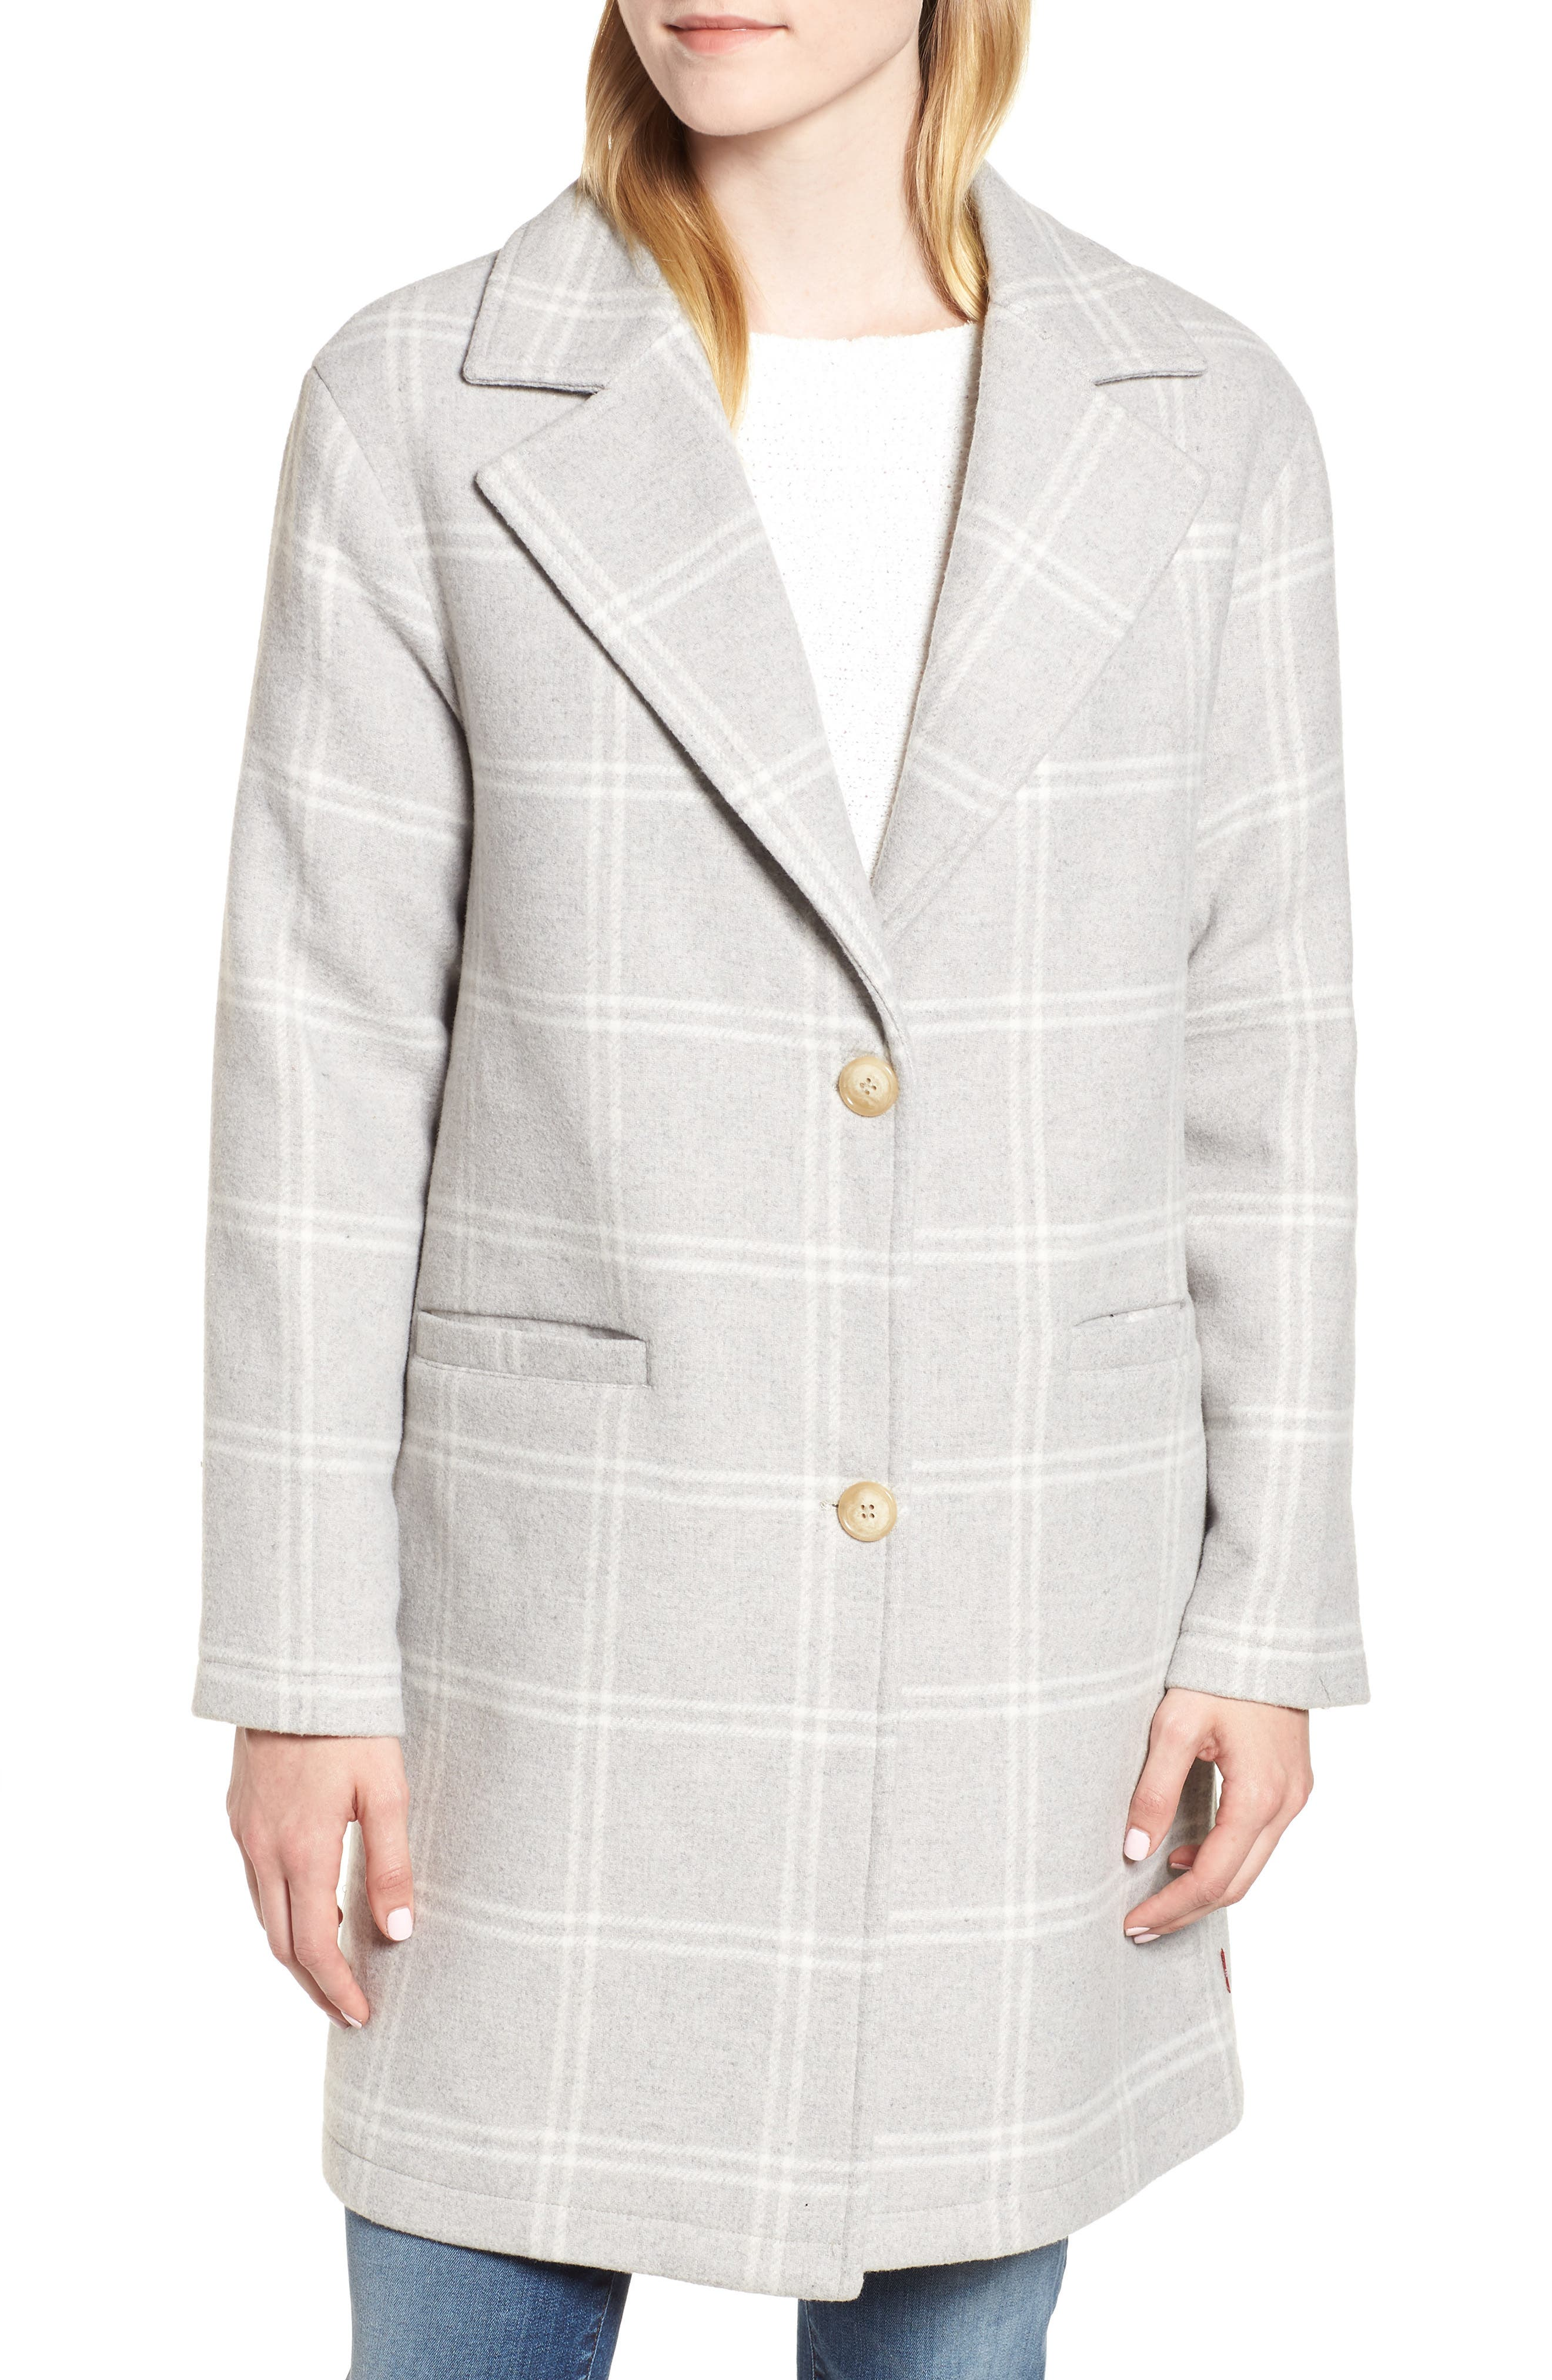 Wool Top Coat,                             Alternate thumbnail 4, color,                             GREY PLAID WOOL